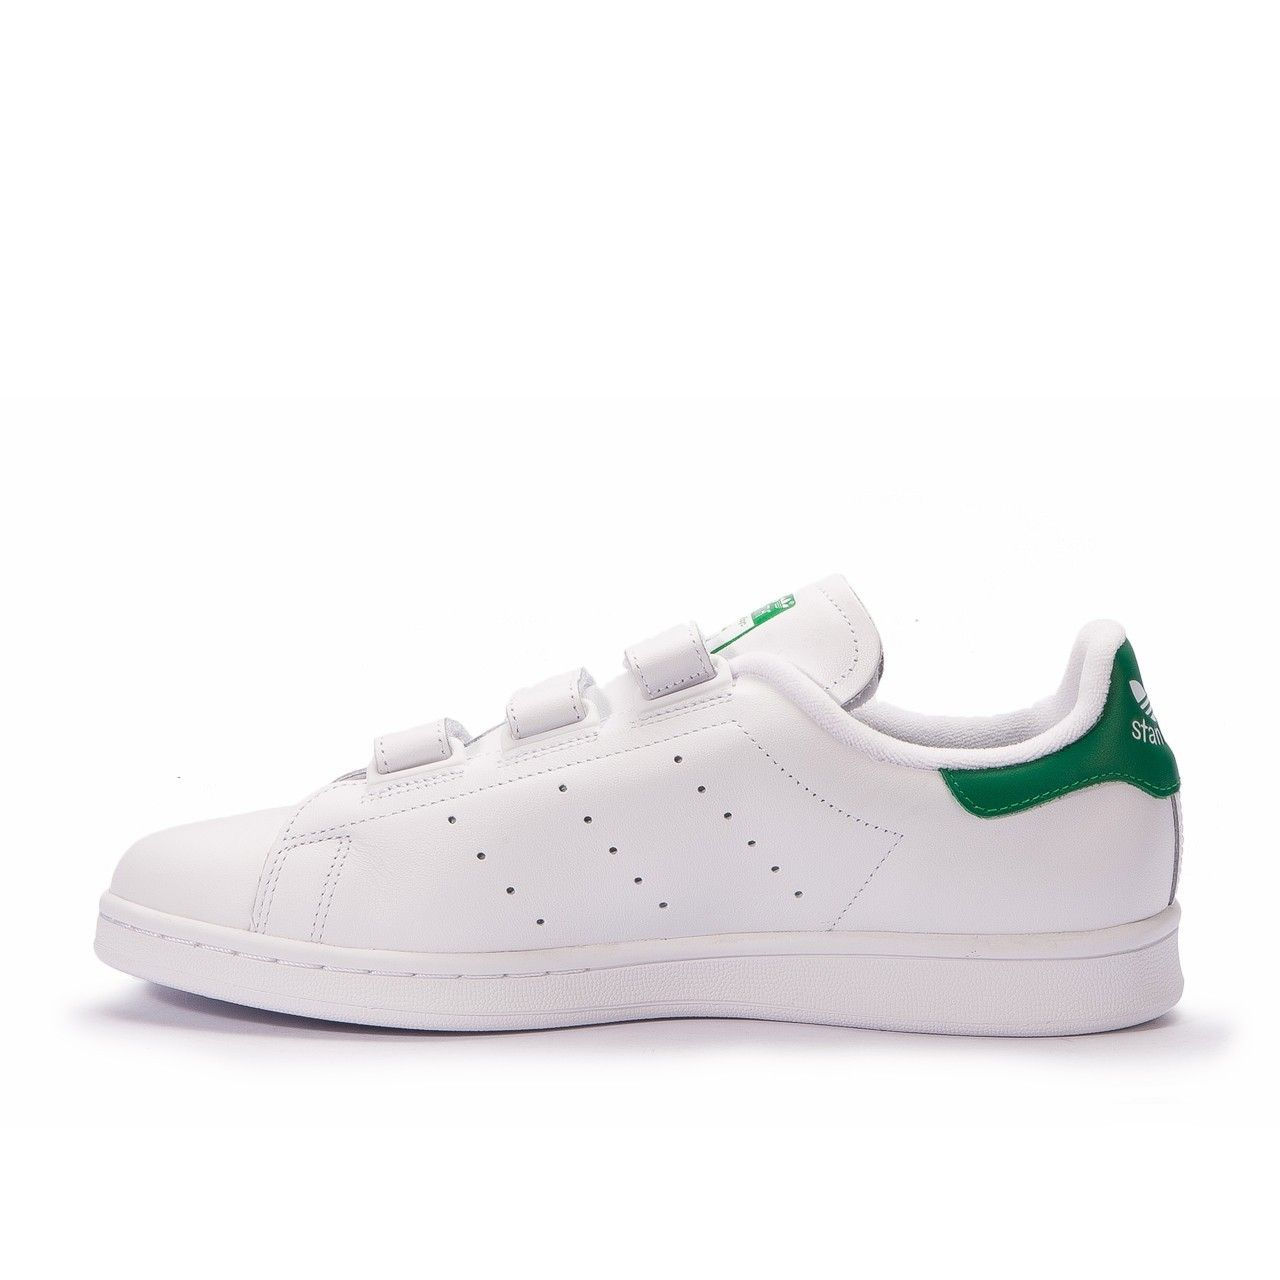 Buy Mens Adidas Stan Smith CF (White / Green) Originals Classic tennis shoe S75187 - uk